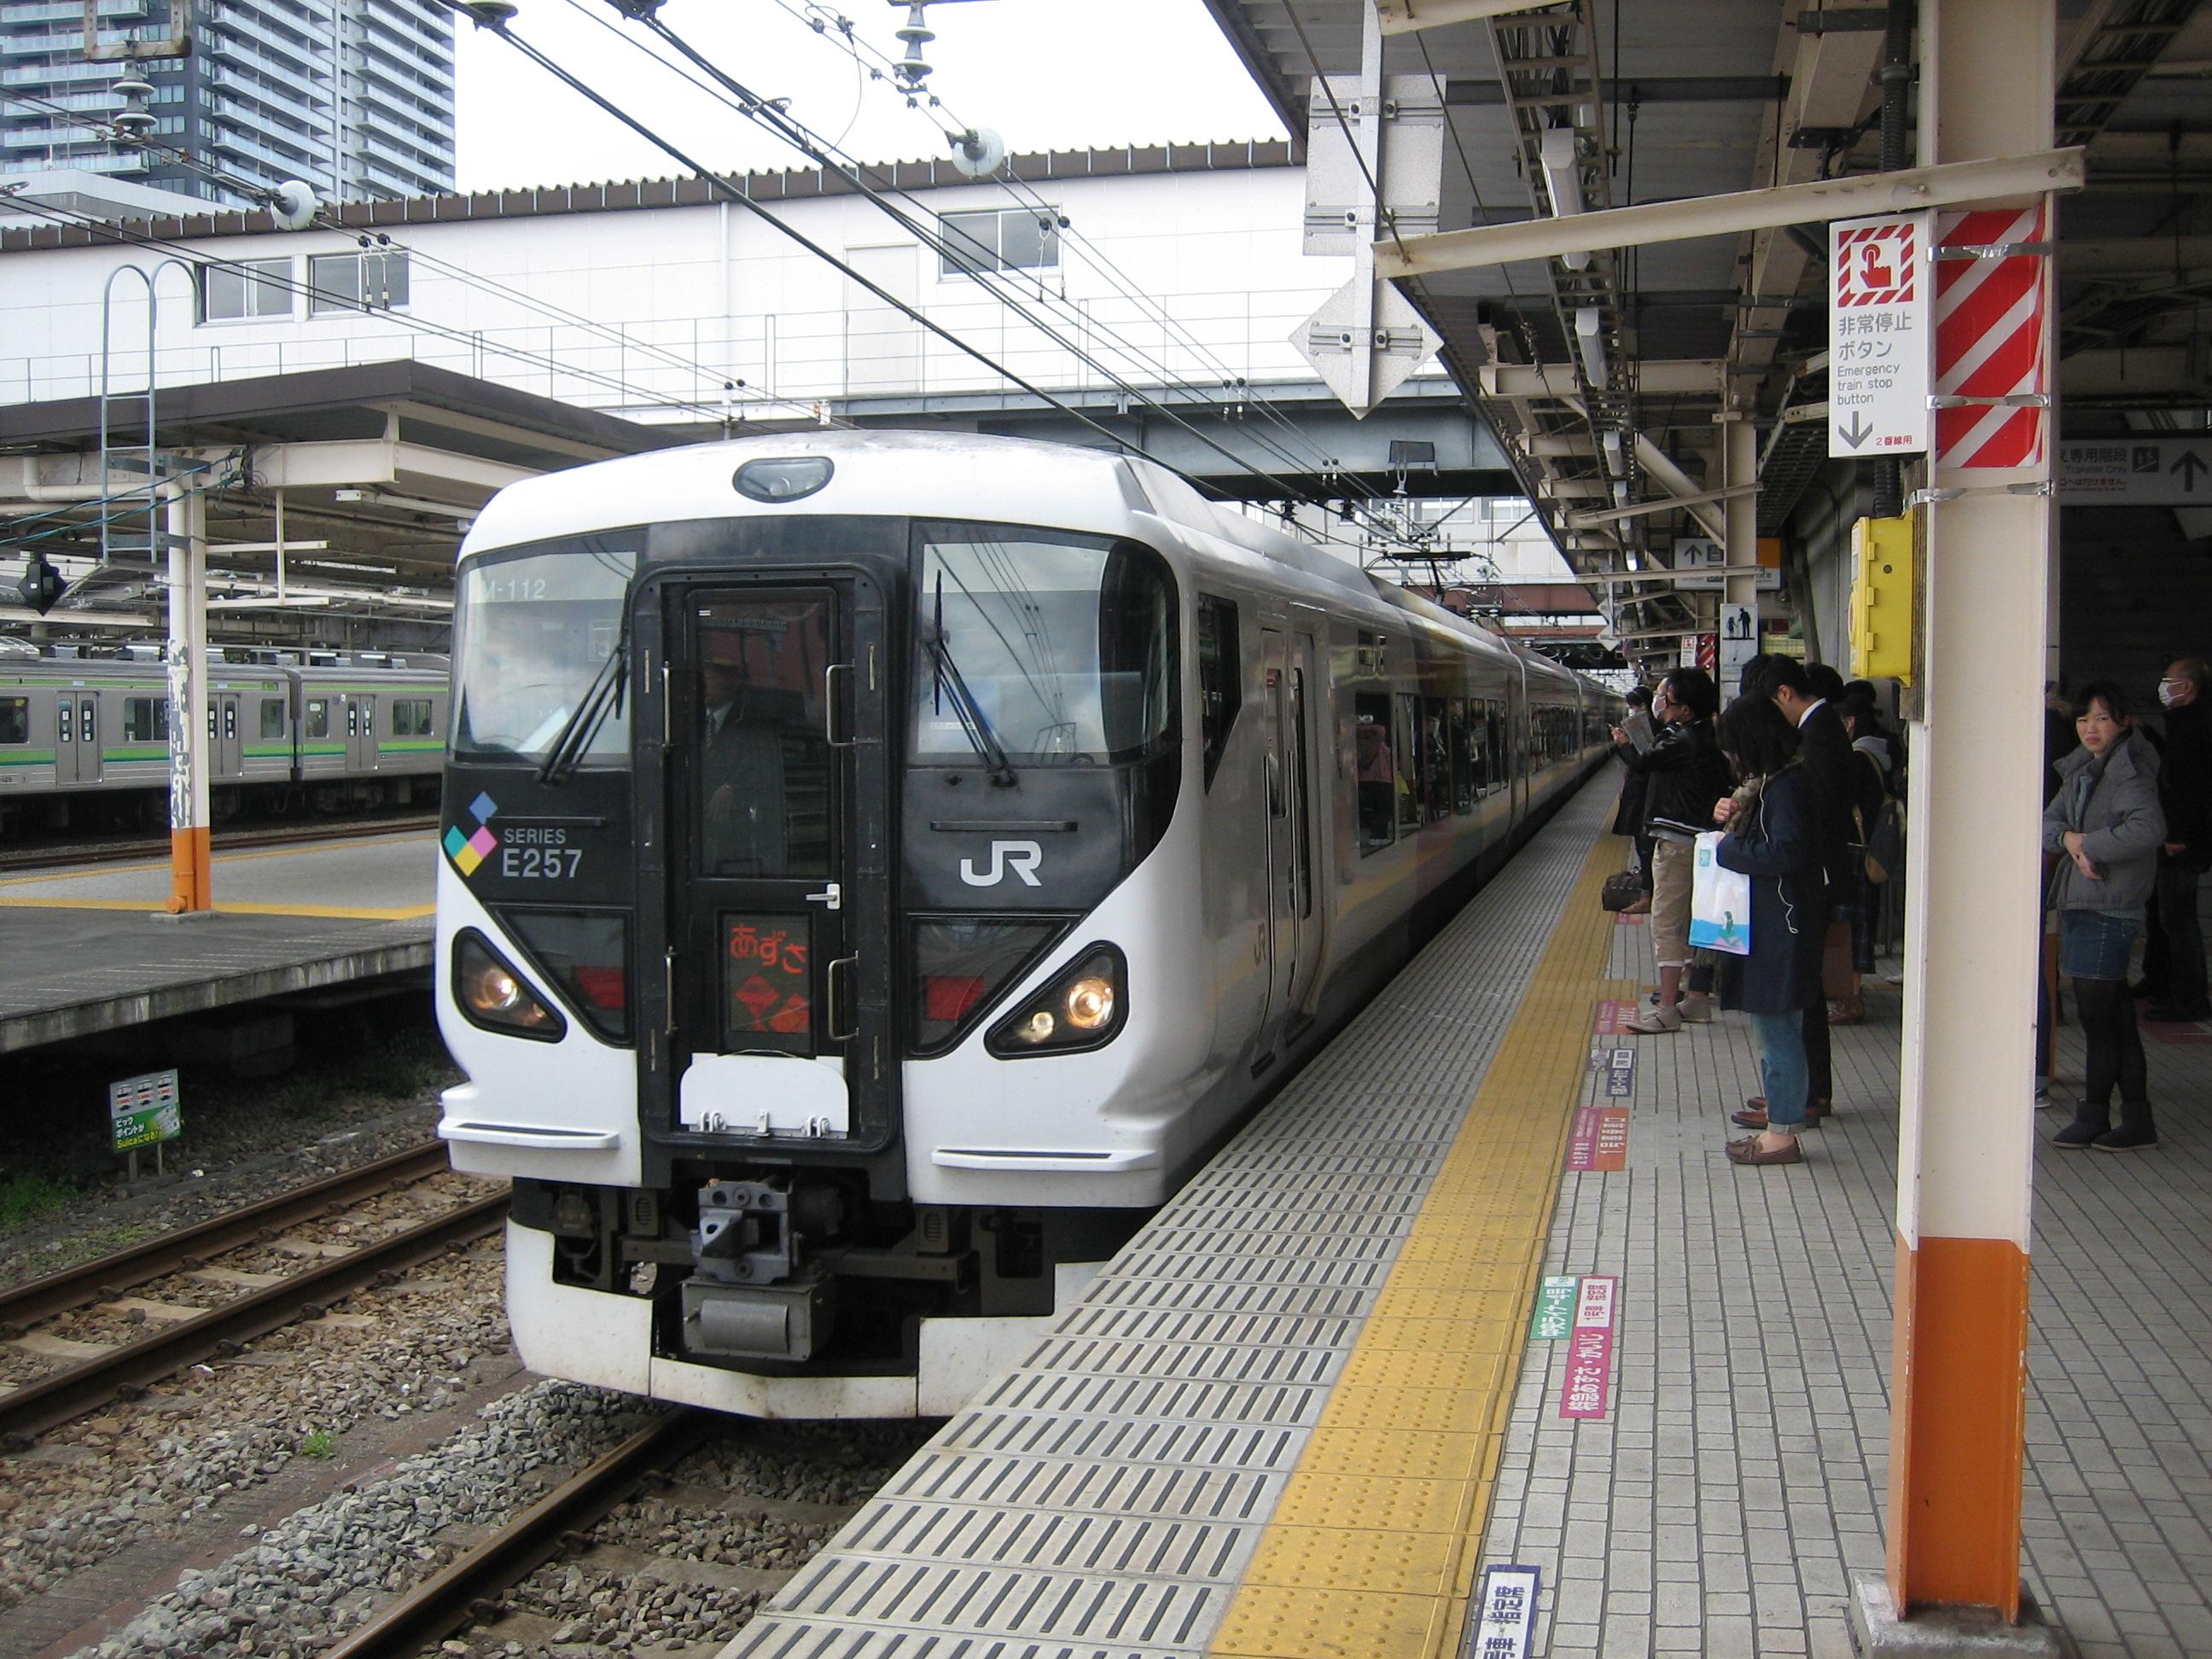 File:JR East E257 on Azusa limited express train service at Hachioji ...